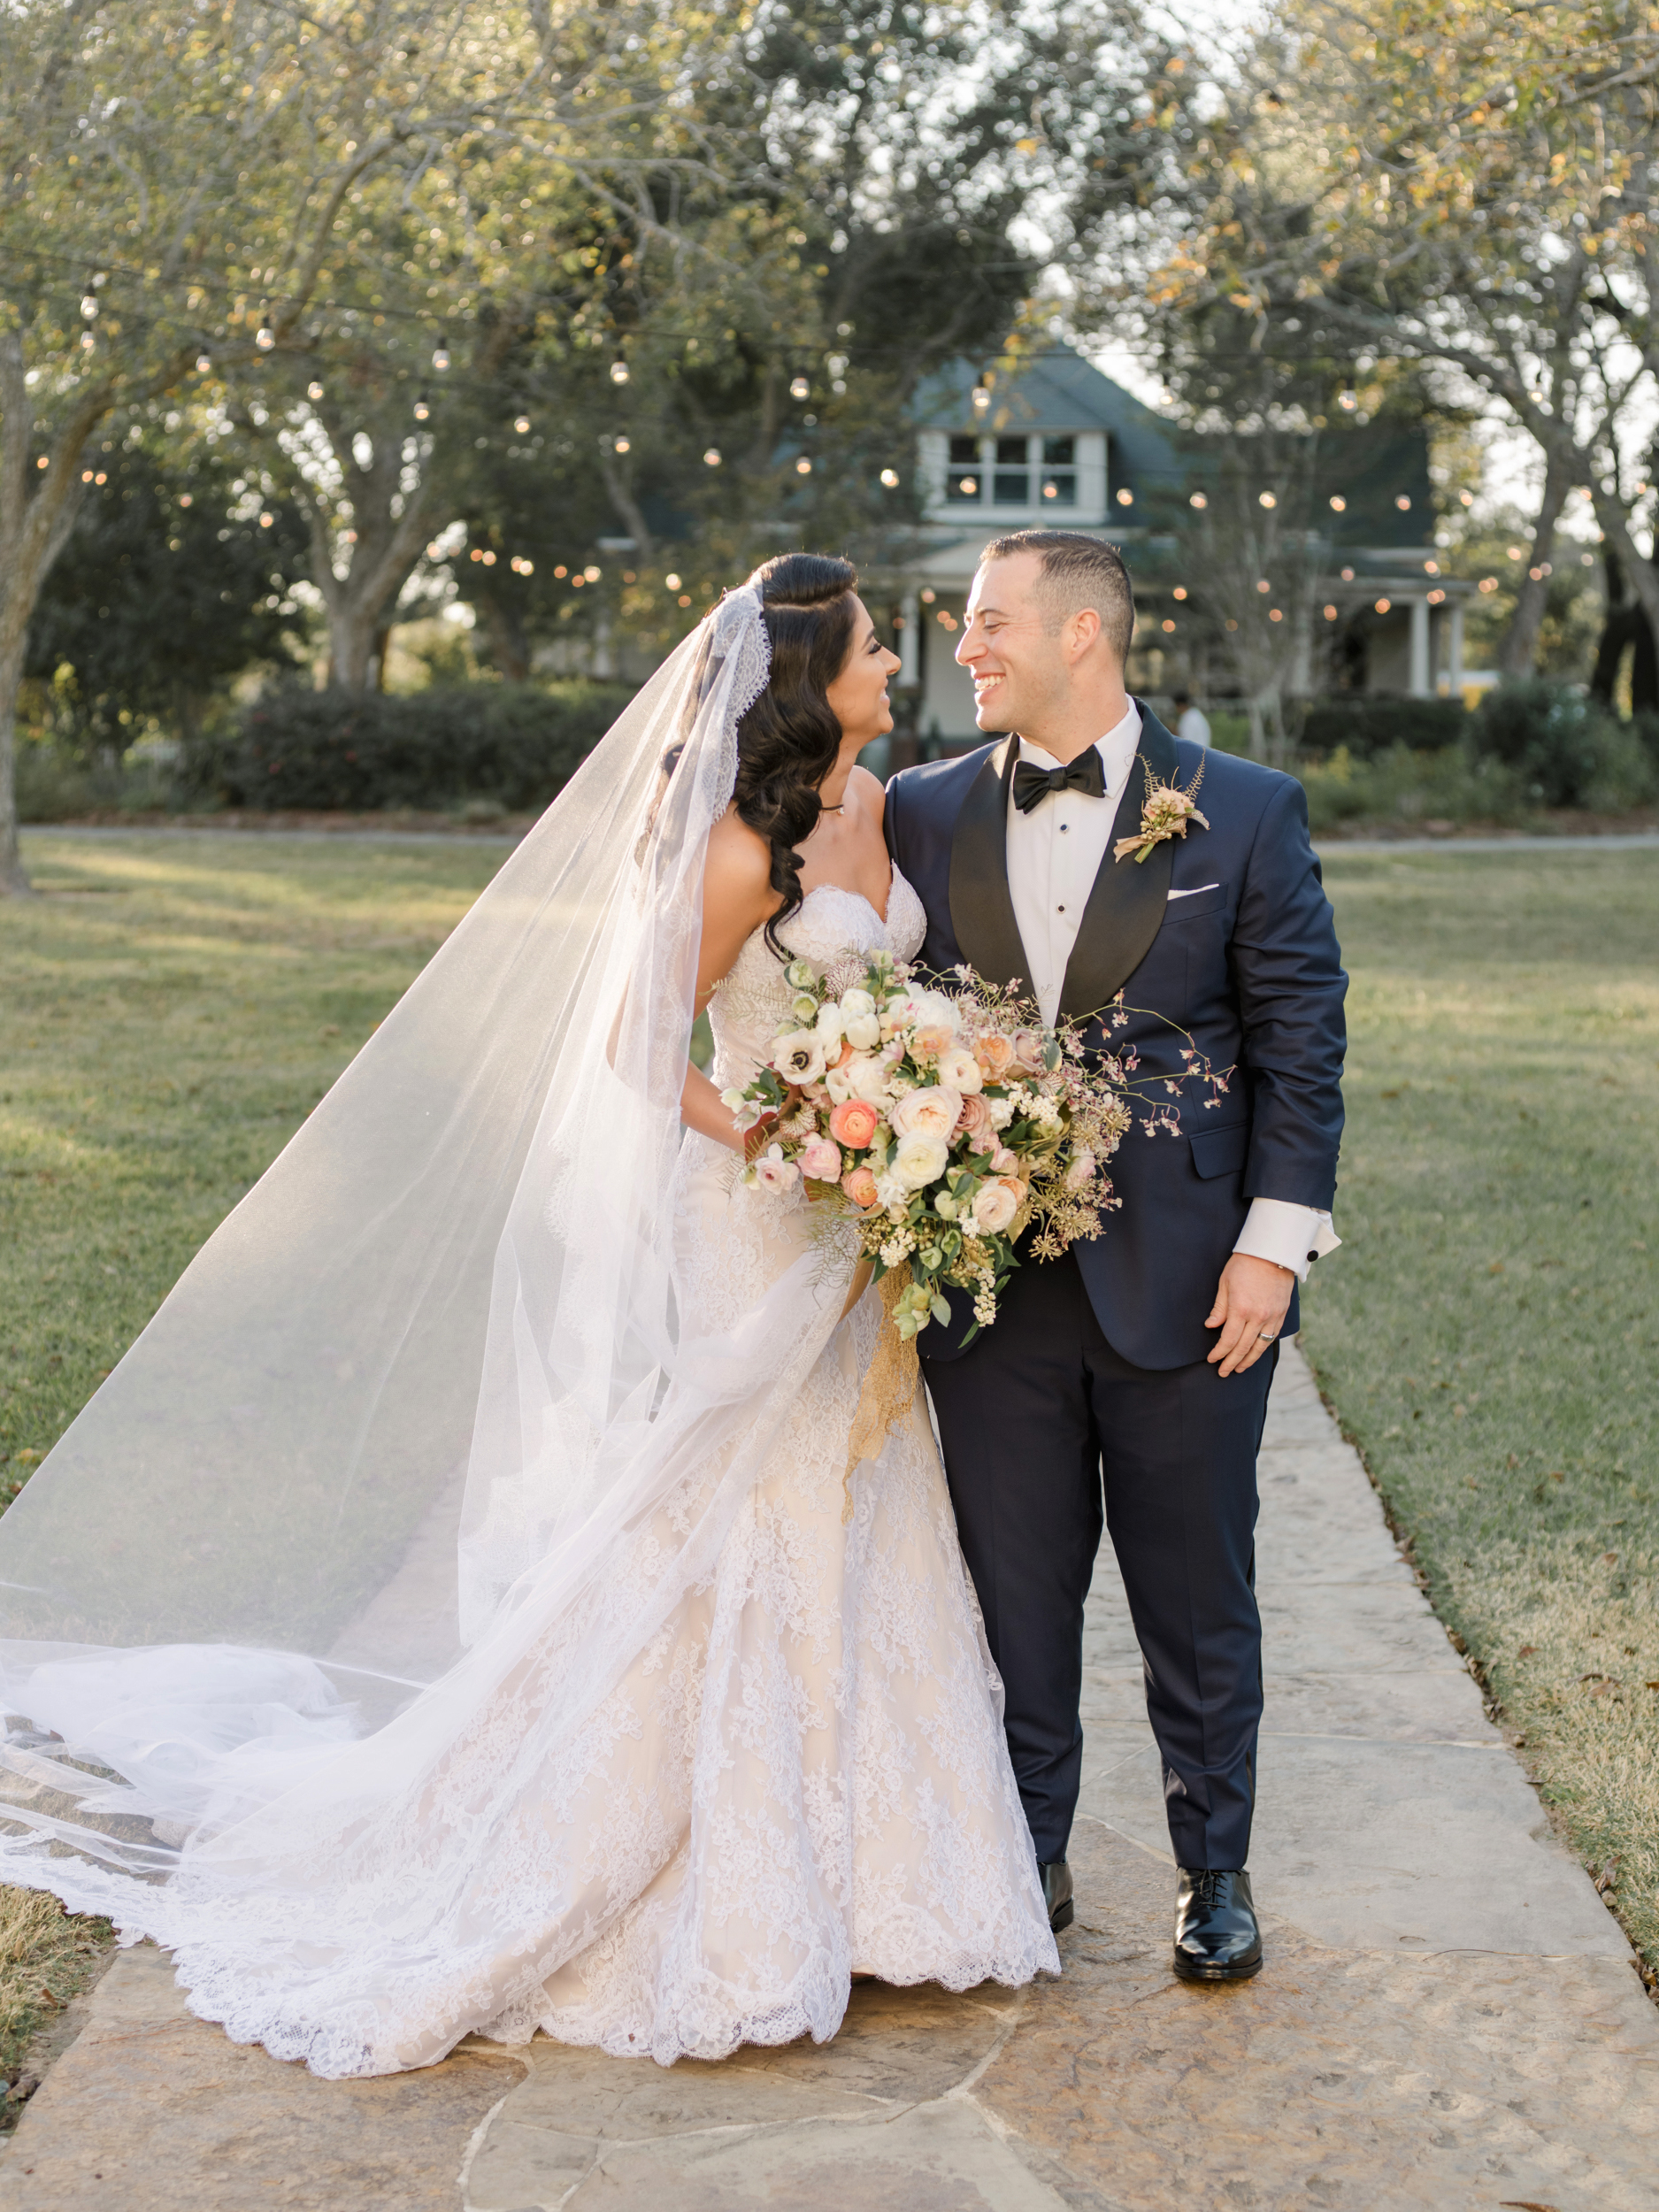 suzanne joseph wedding couple corbin gurkin